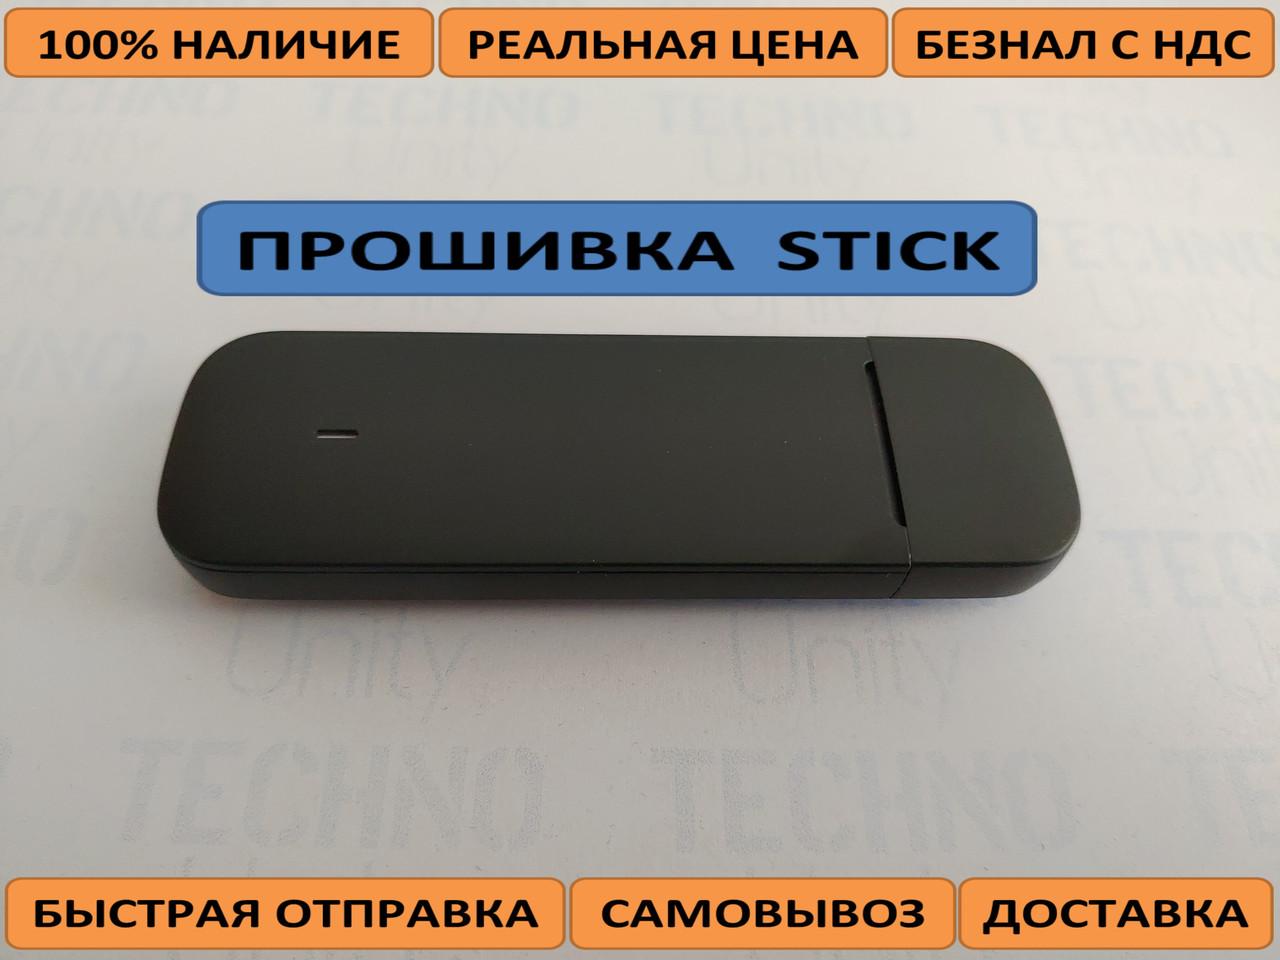 4G USB модем Huawei E3372H-607 LTE Stick Firmware Unlock